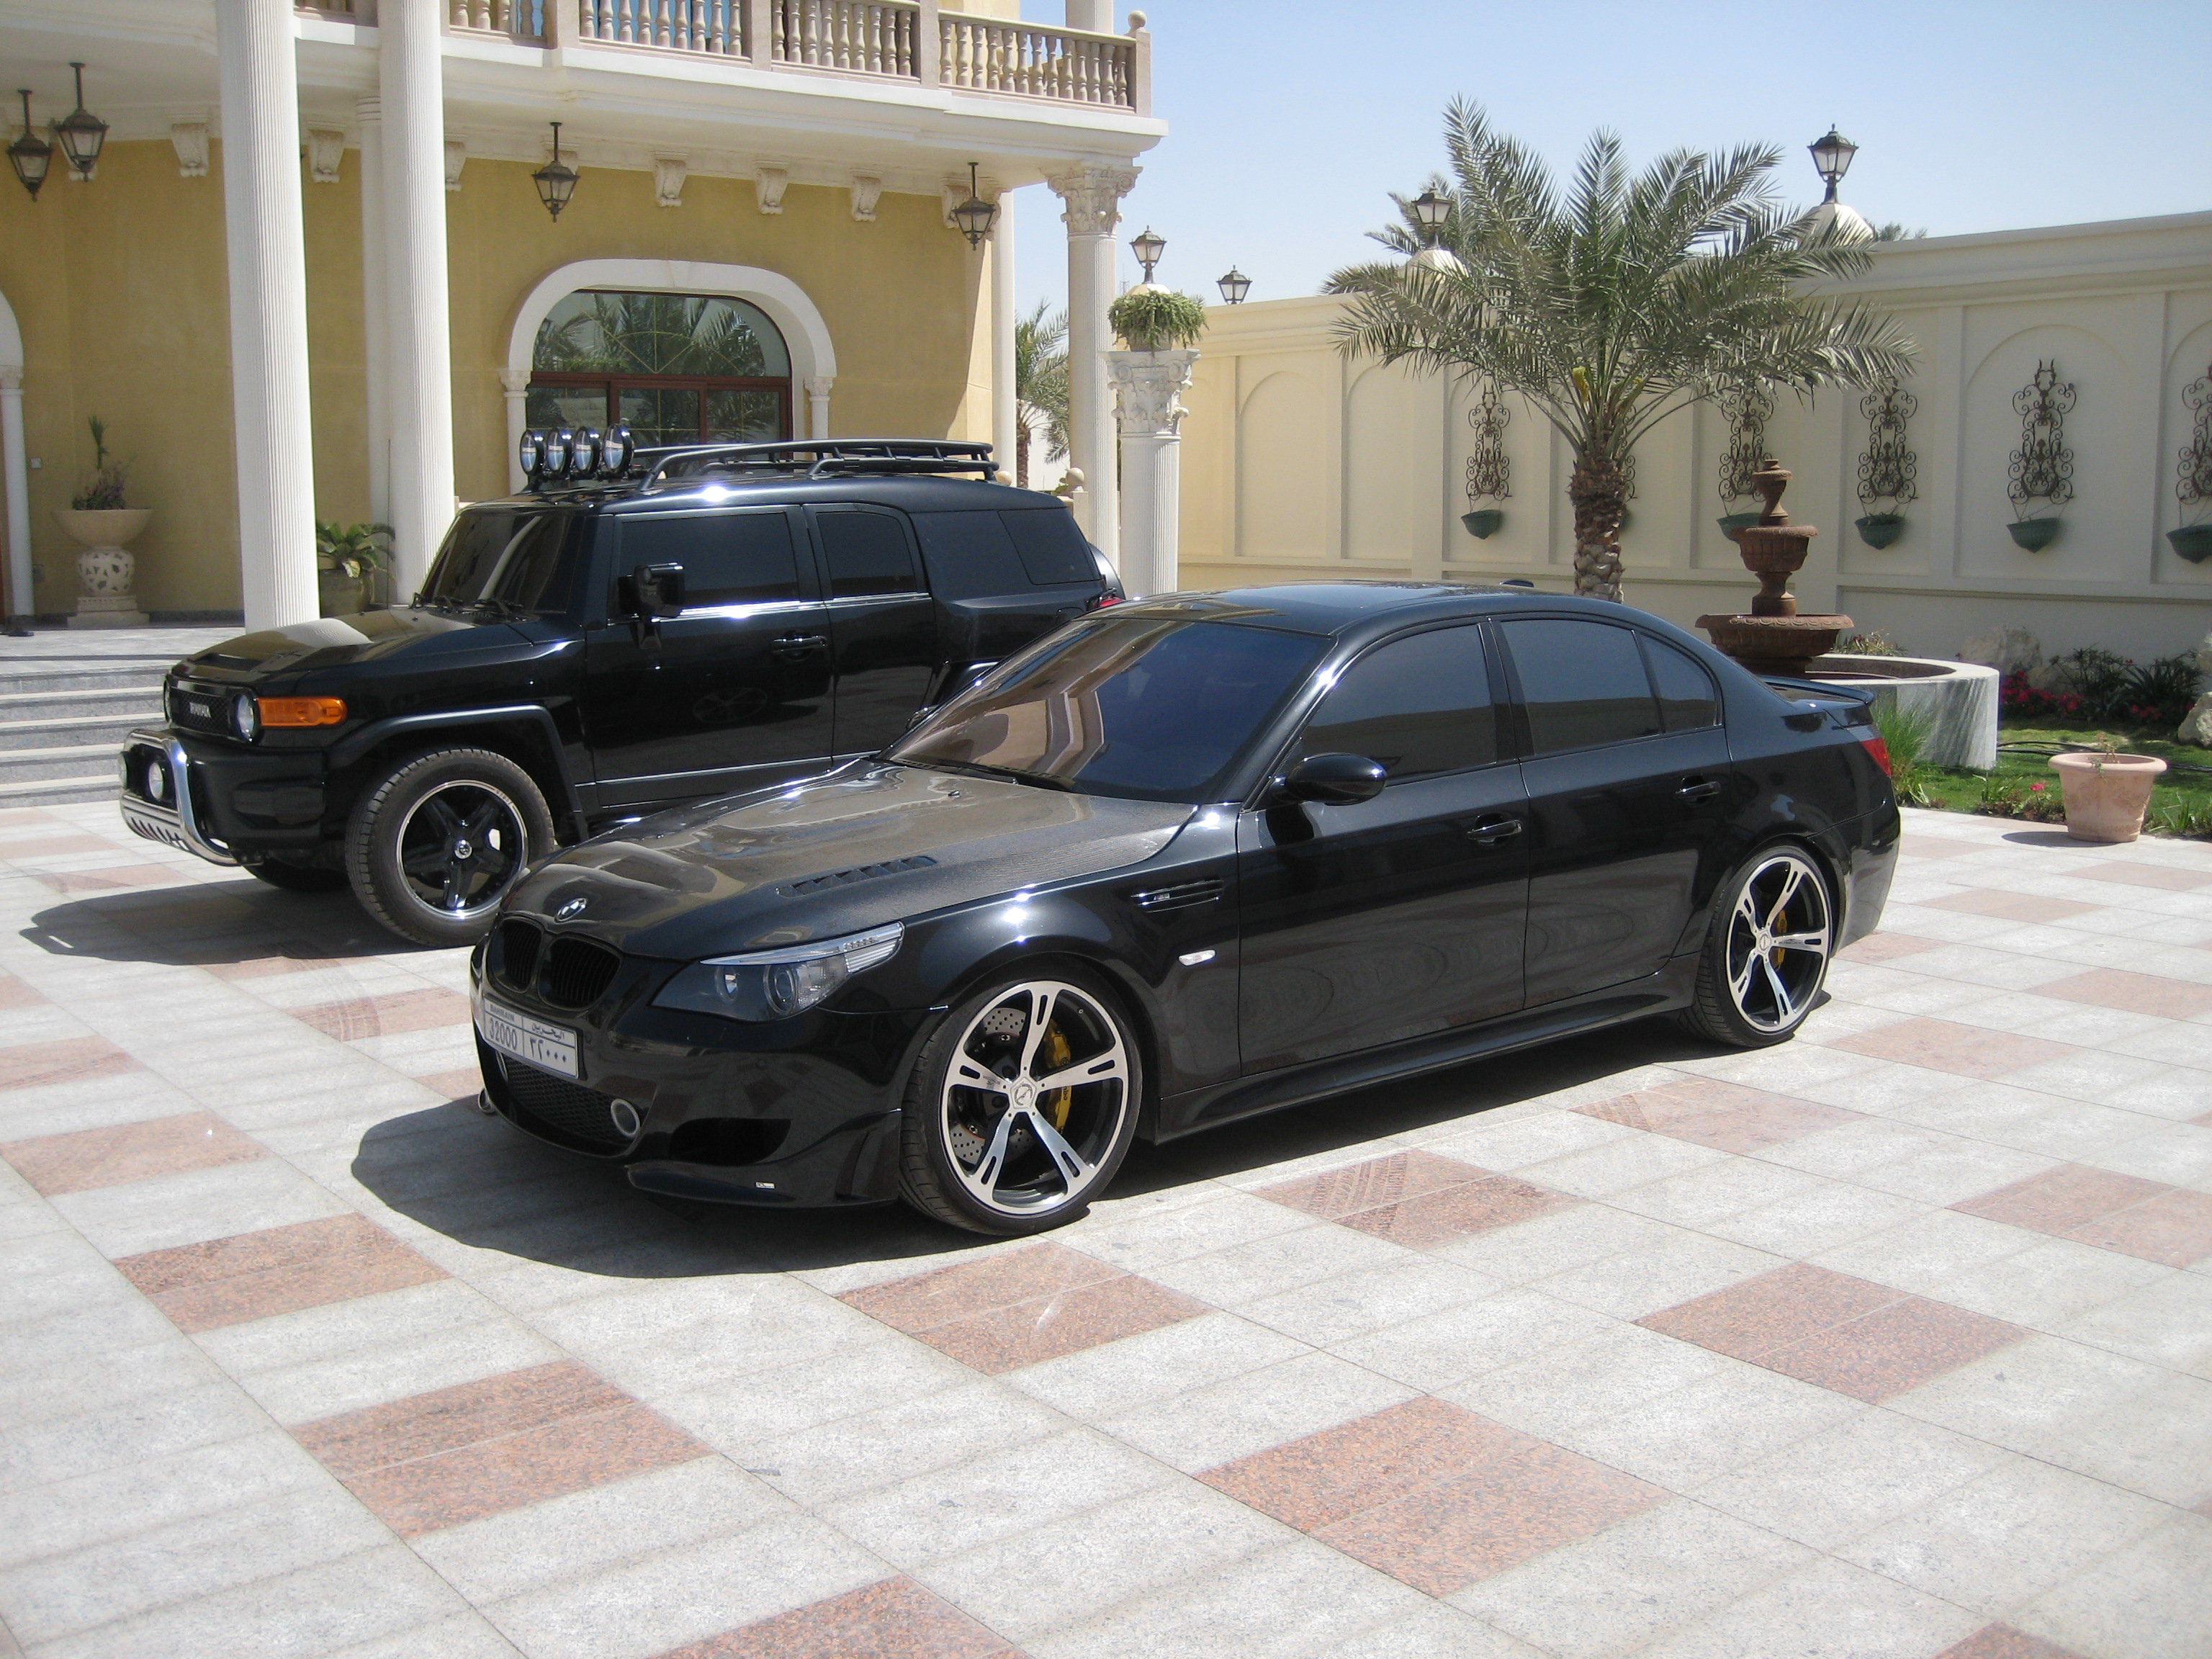 Carbon Fiber Hood On Jet Black Car Page 2 5series Net Forums